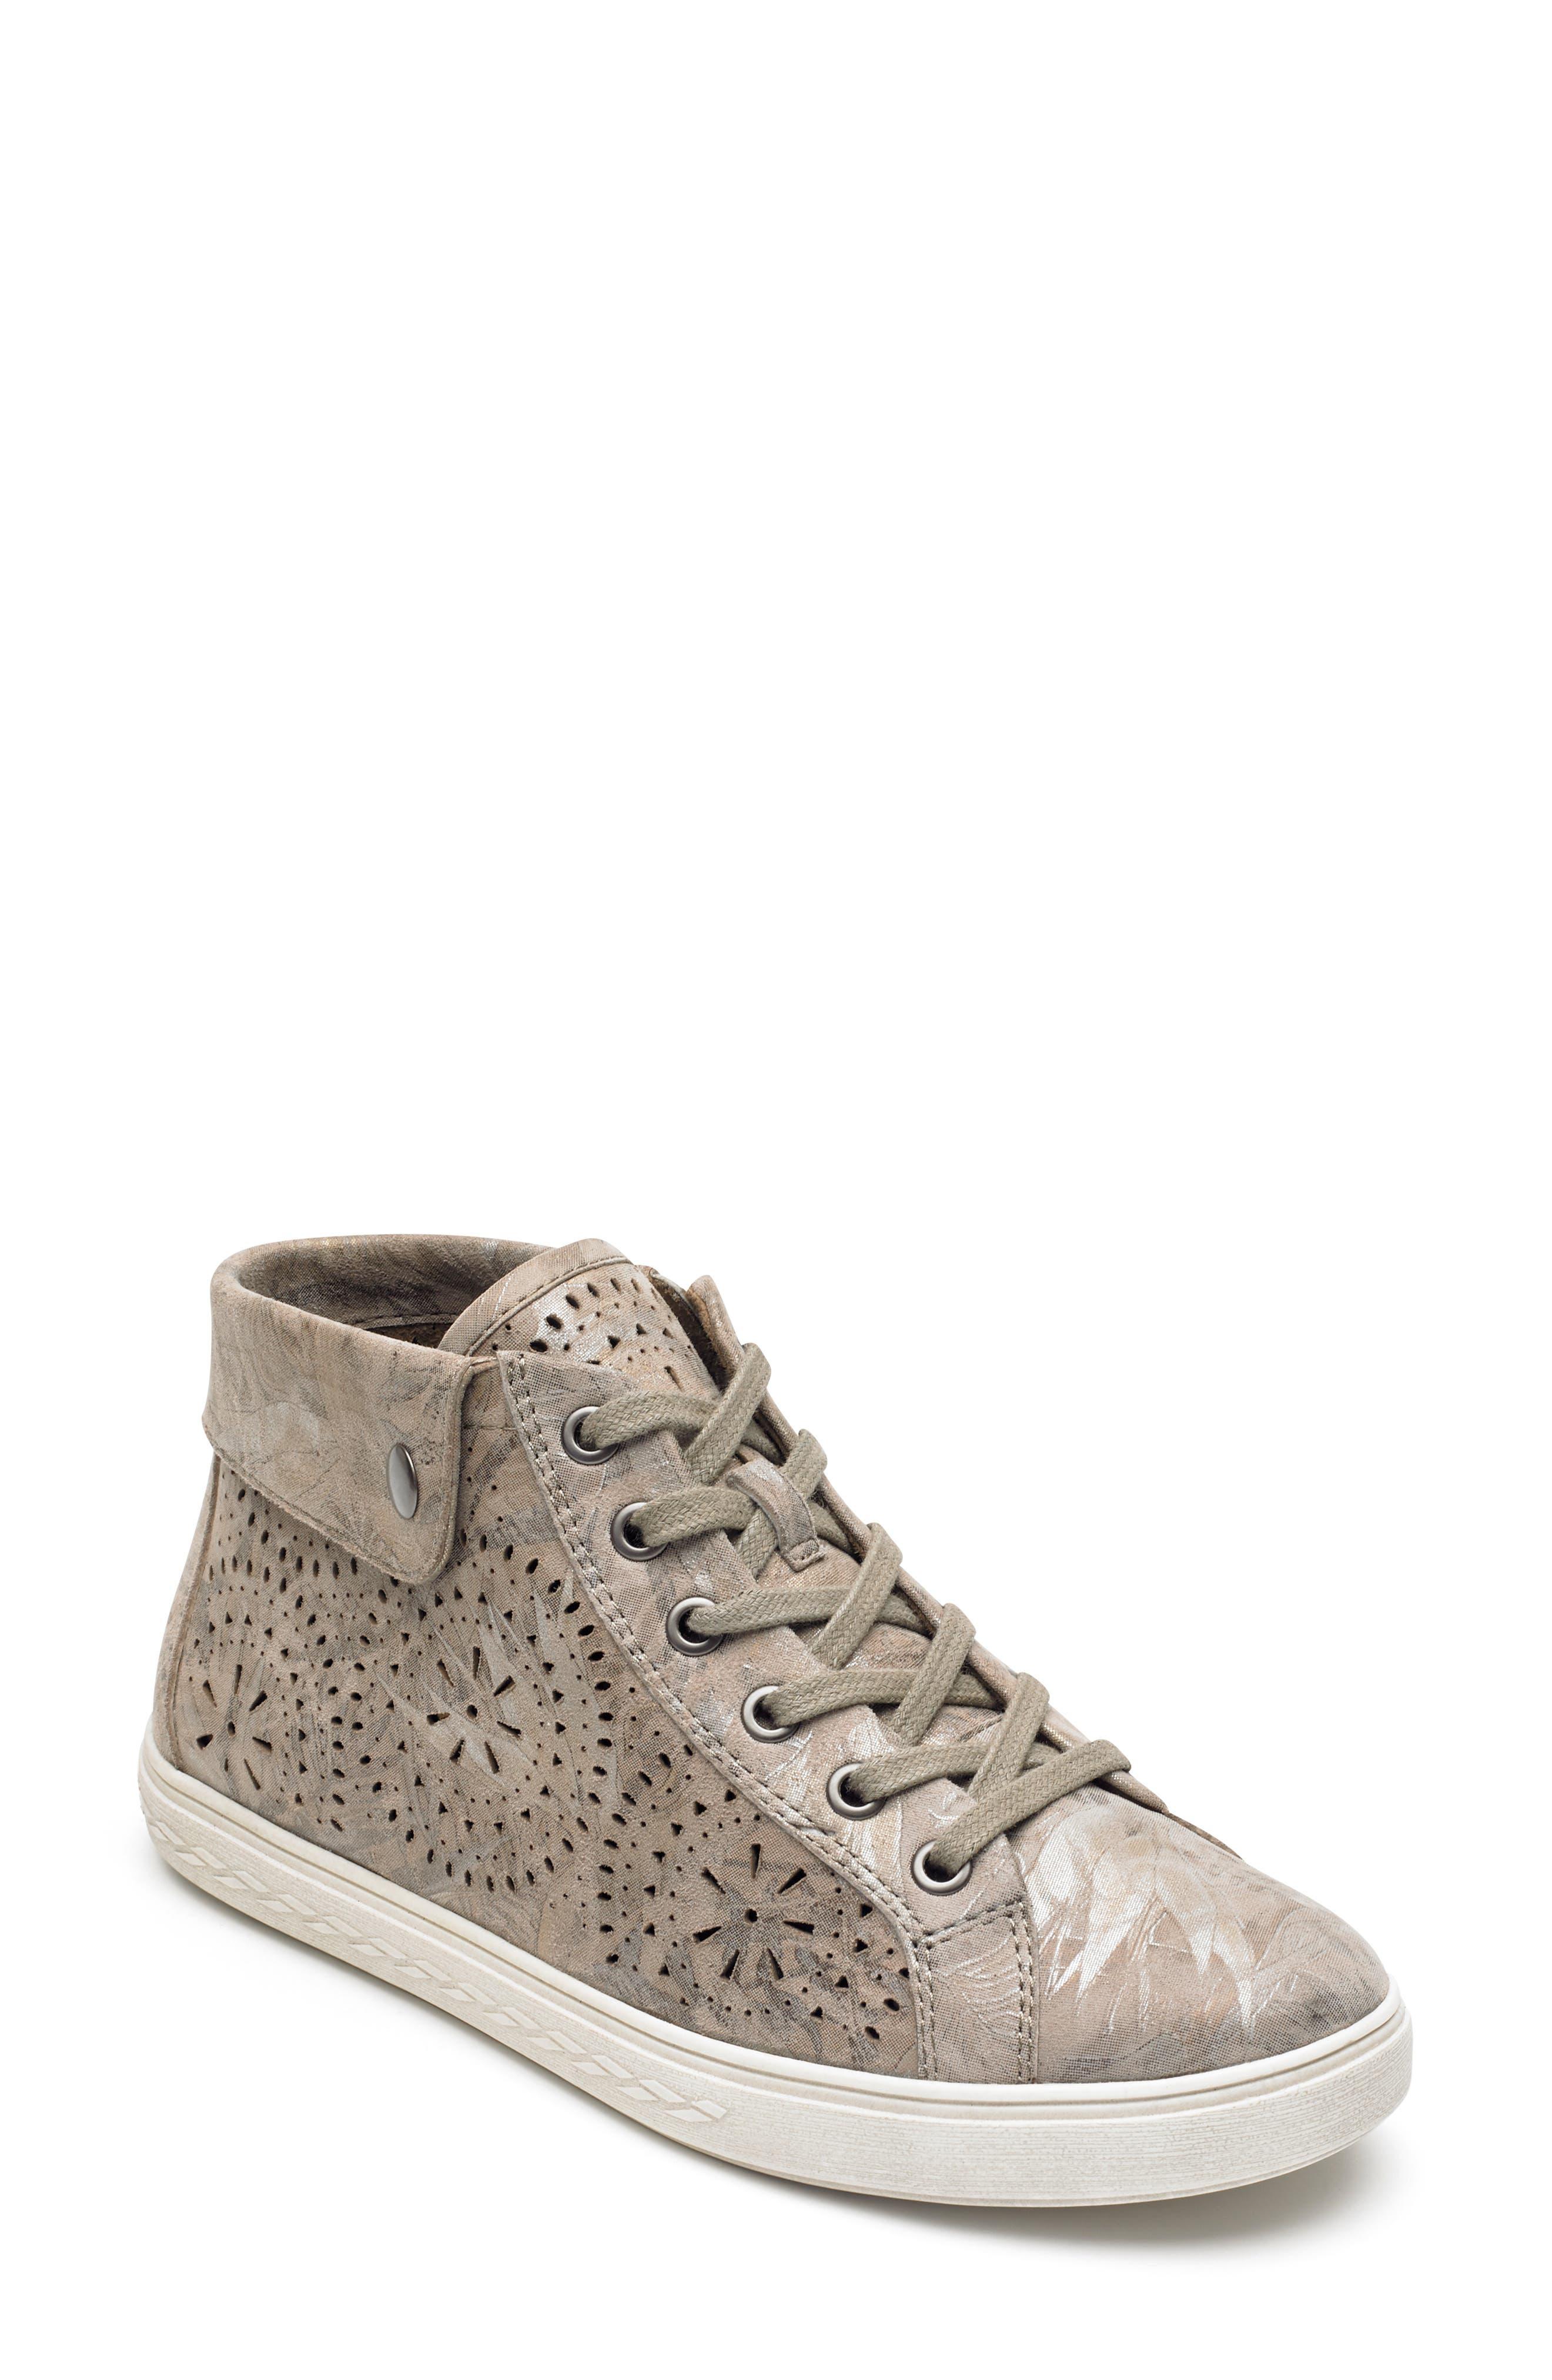 Rockport Cobb Hill Willa High Top Sneaker, Grey